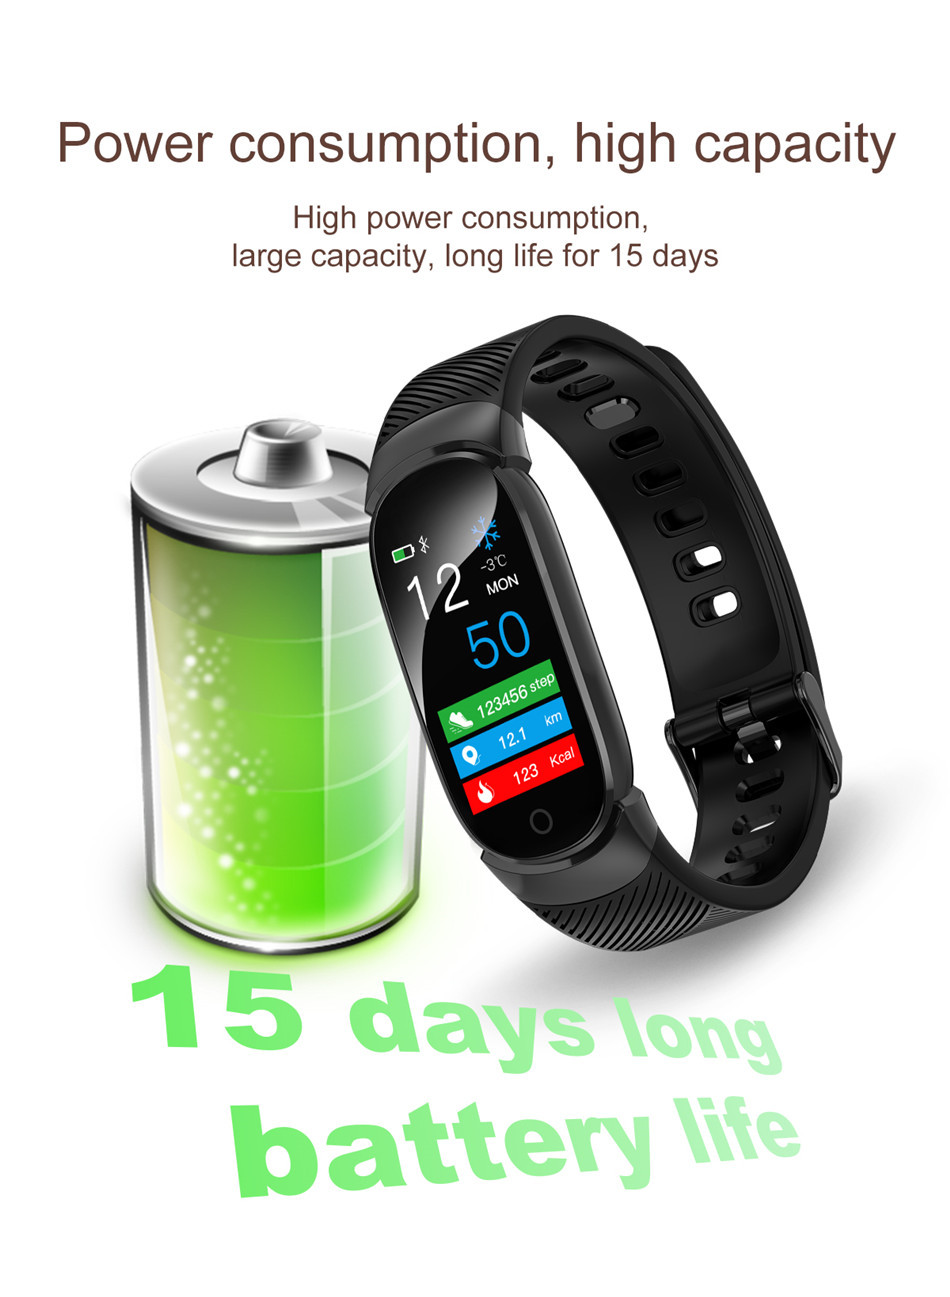 HTB1pMNzavfsK1RjSszgq6yXzpXaf LIGE Sport Smart Bracelet Women Men Waterproof Smart Watch Heart Rate Blood Pressure Pedometer Smart Wristband For Android iOS